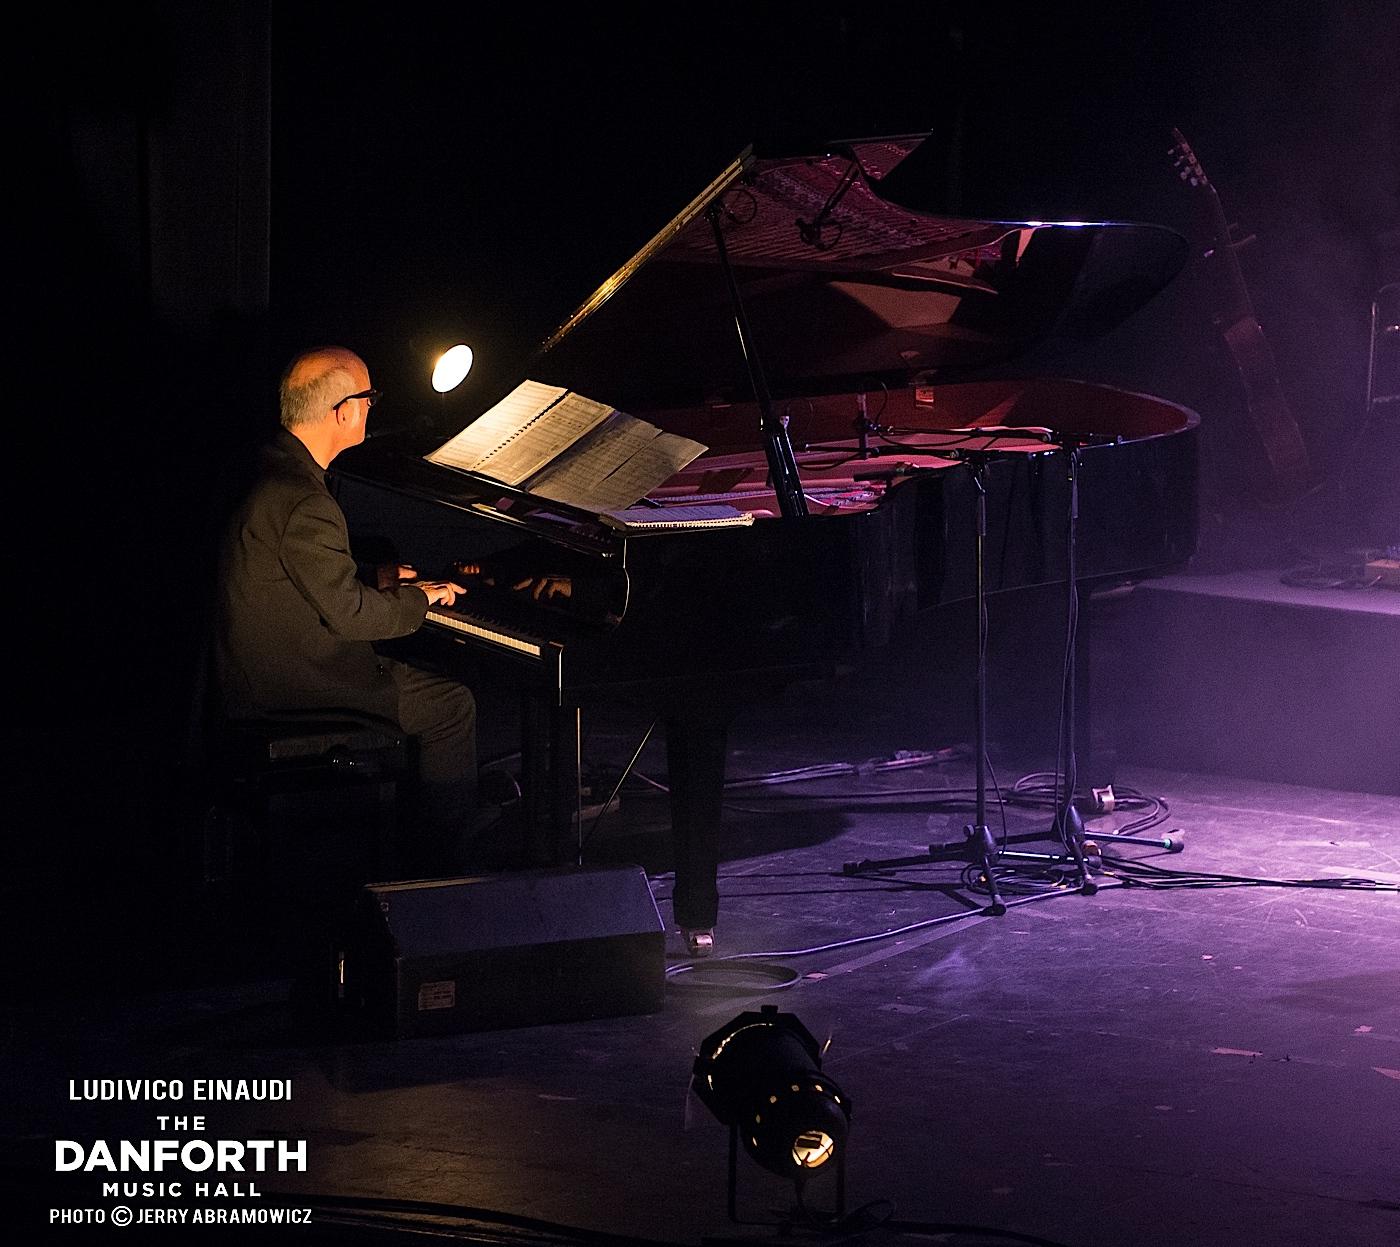 20130517 Ludivico Einaudi performs at The Danforth Music Hall Toronto 0176